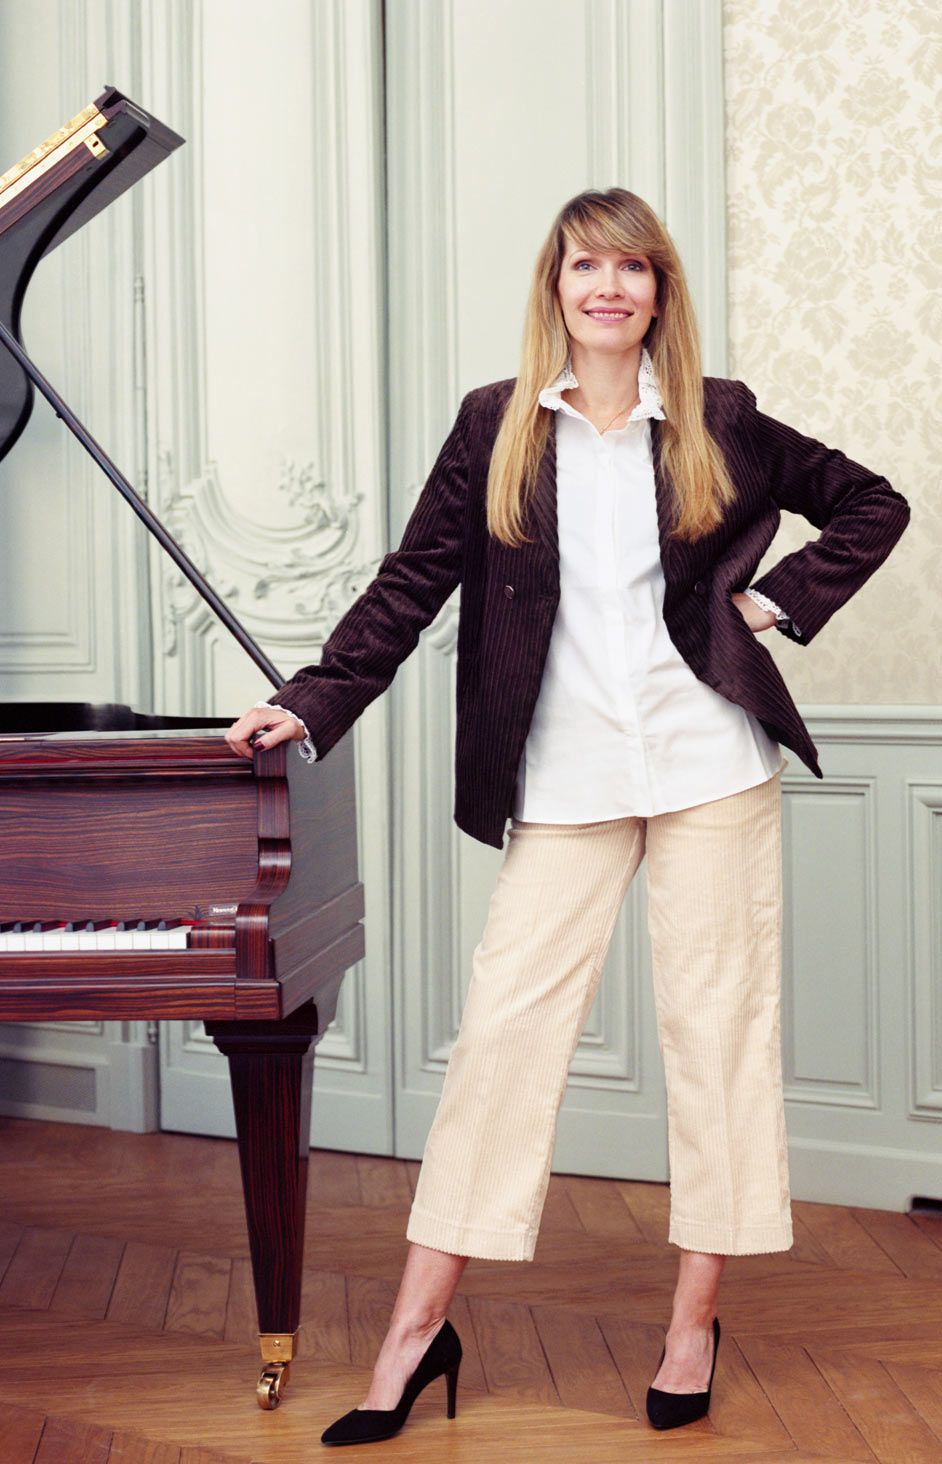 Nathalie Rozborski business woman entrepreneure Nelly Rodi